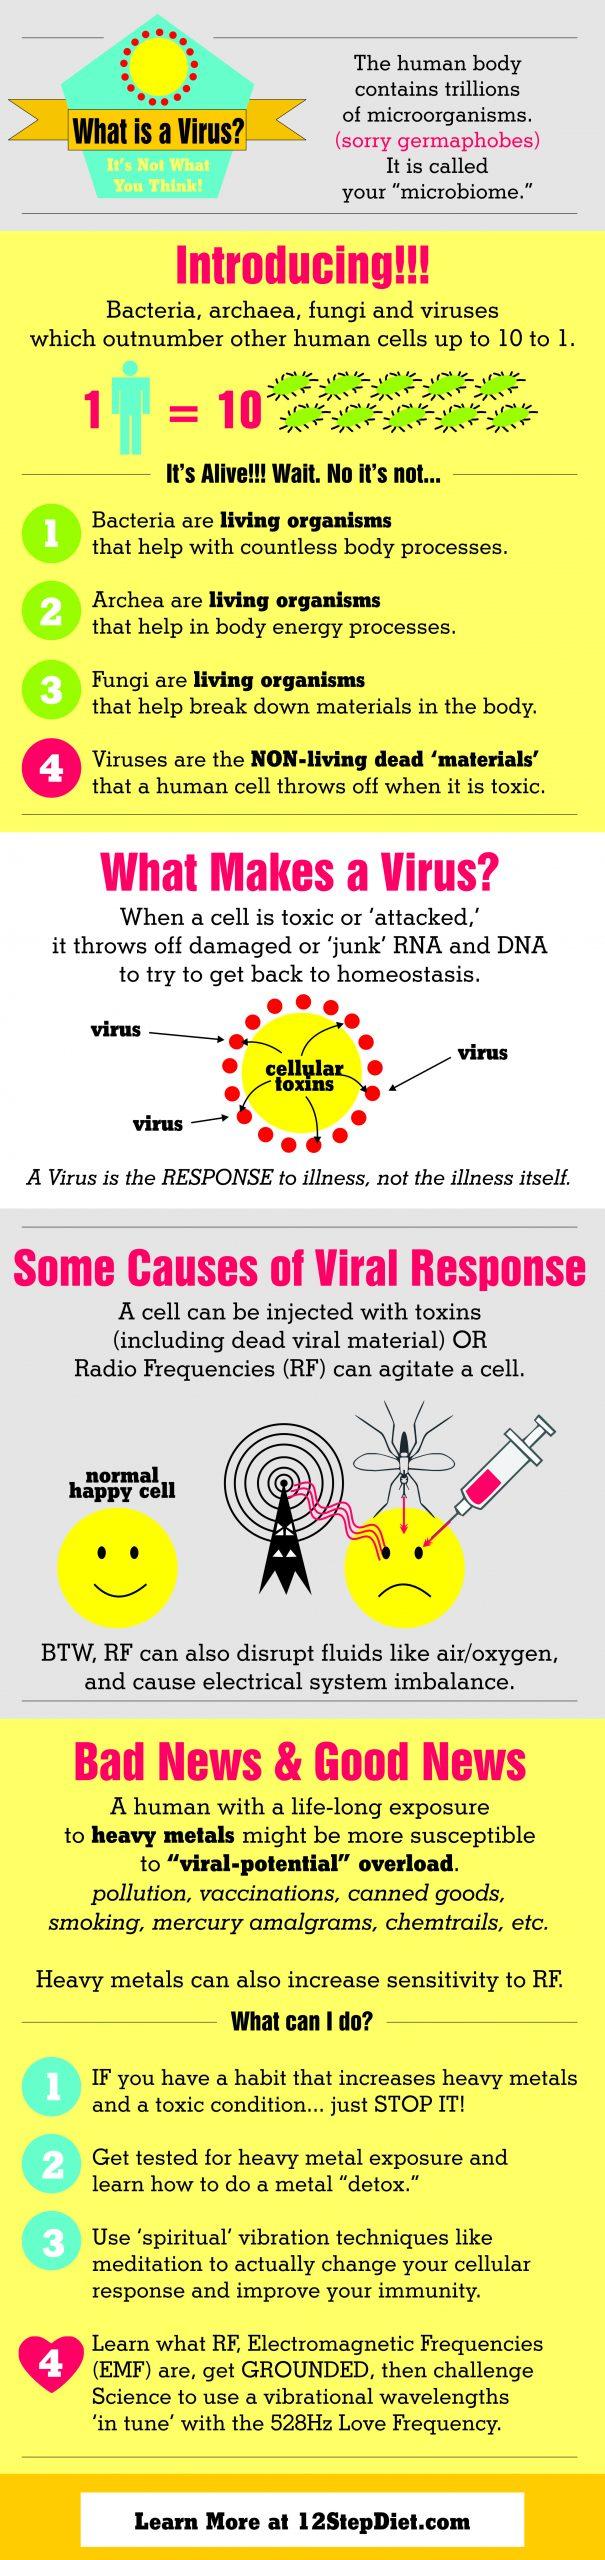 virus viral infographic